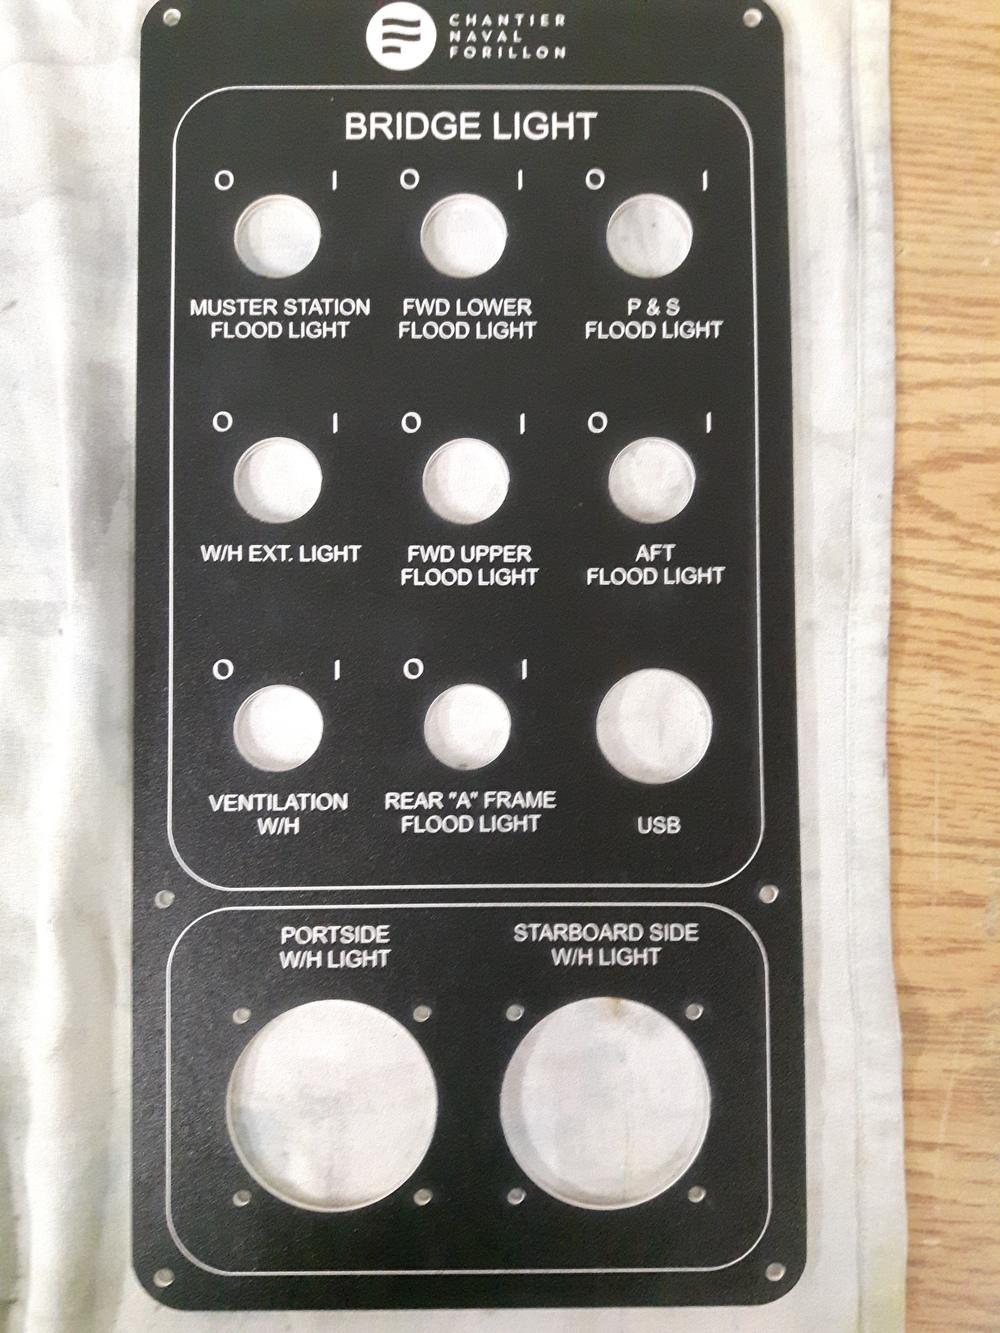 Large control panel